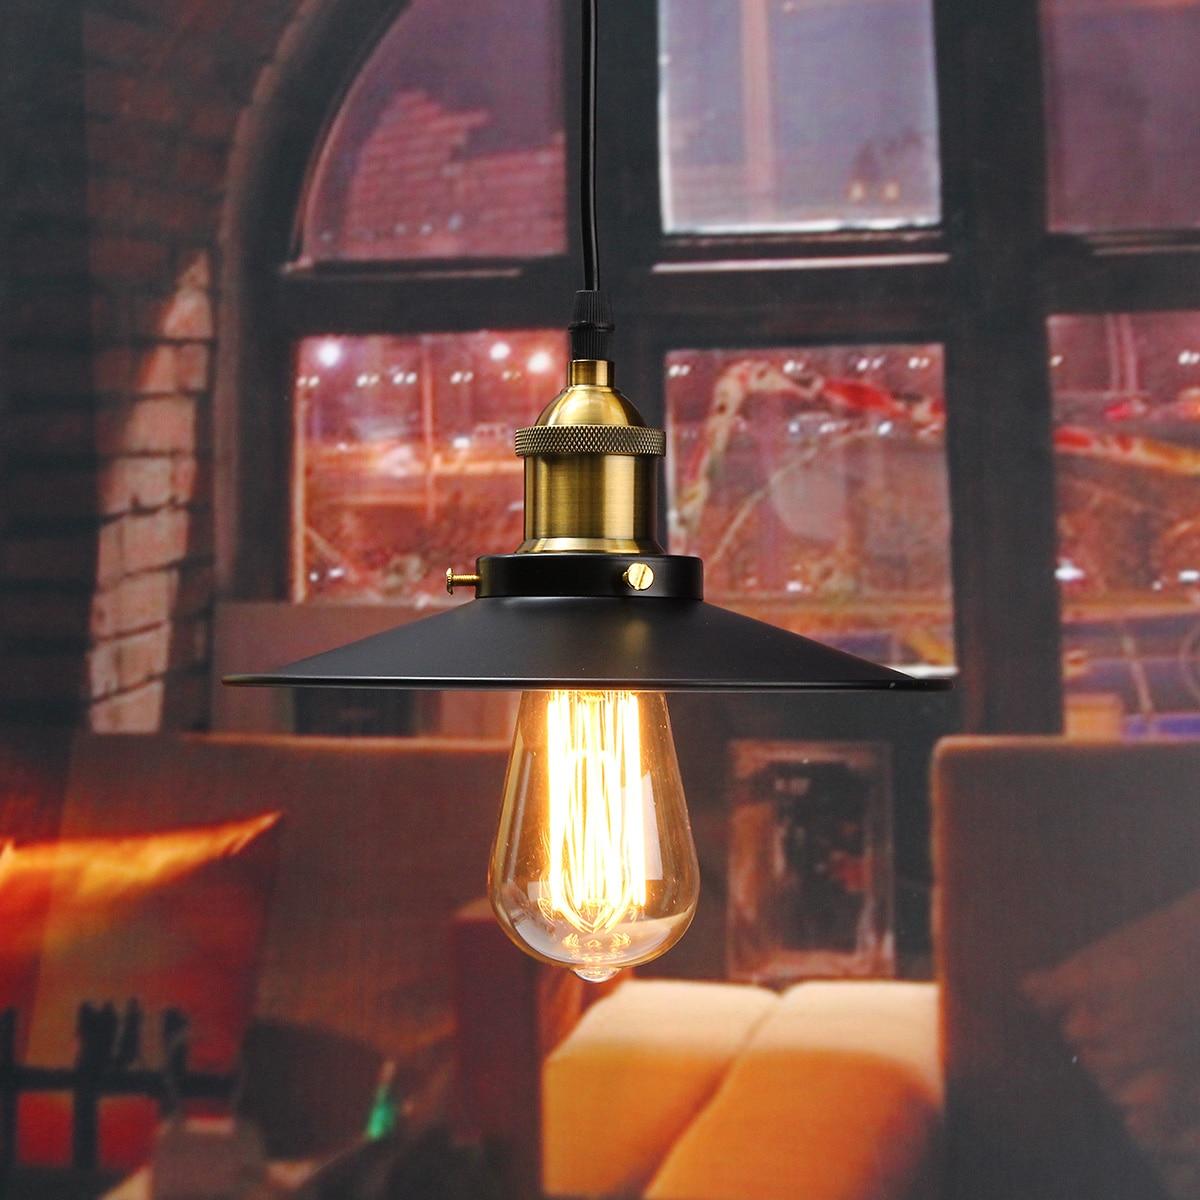 E27 Industrial Retro Vintage Iron Ceiling Lamp outdoor balcony Nordic creative vintage bedroom Pendant Light Chandelier Fixture